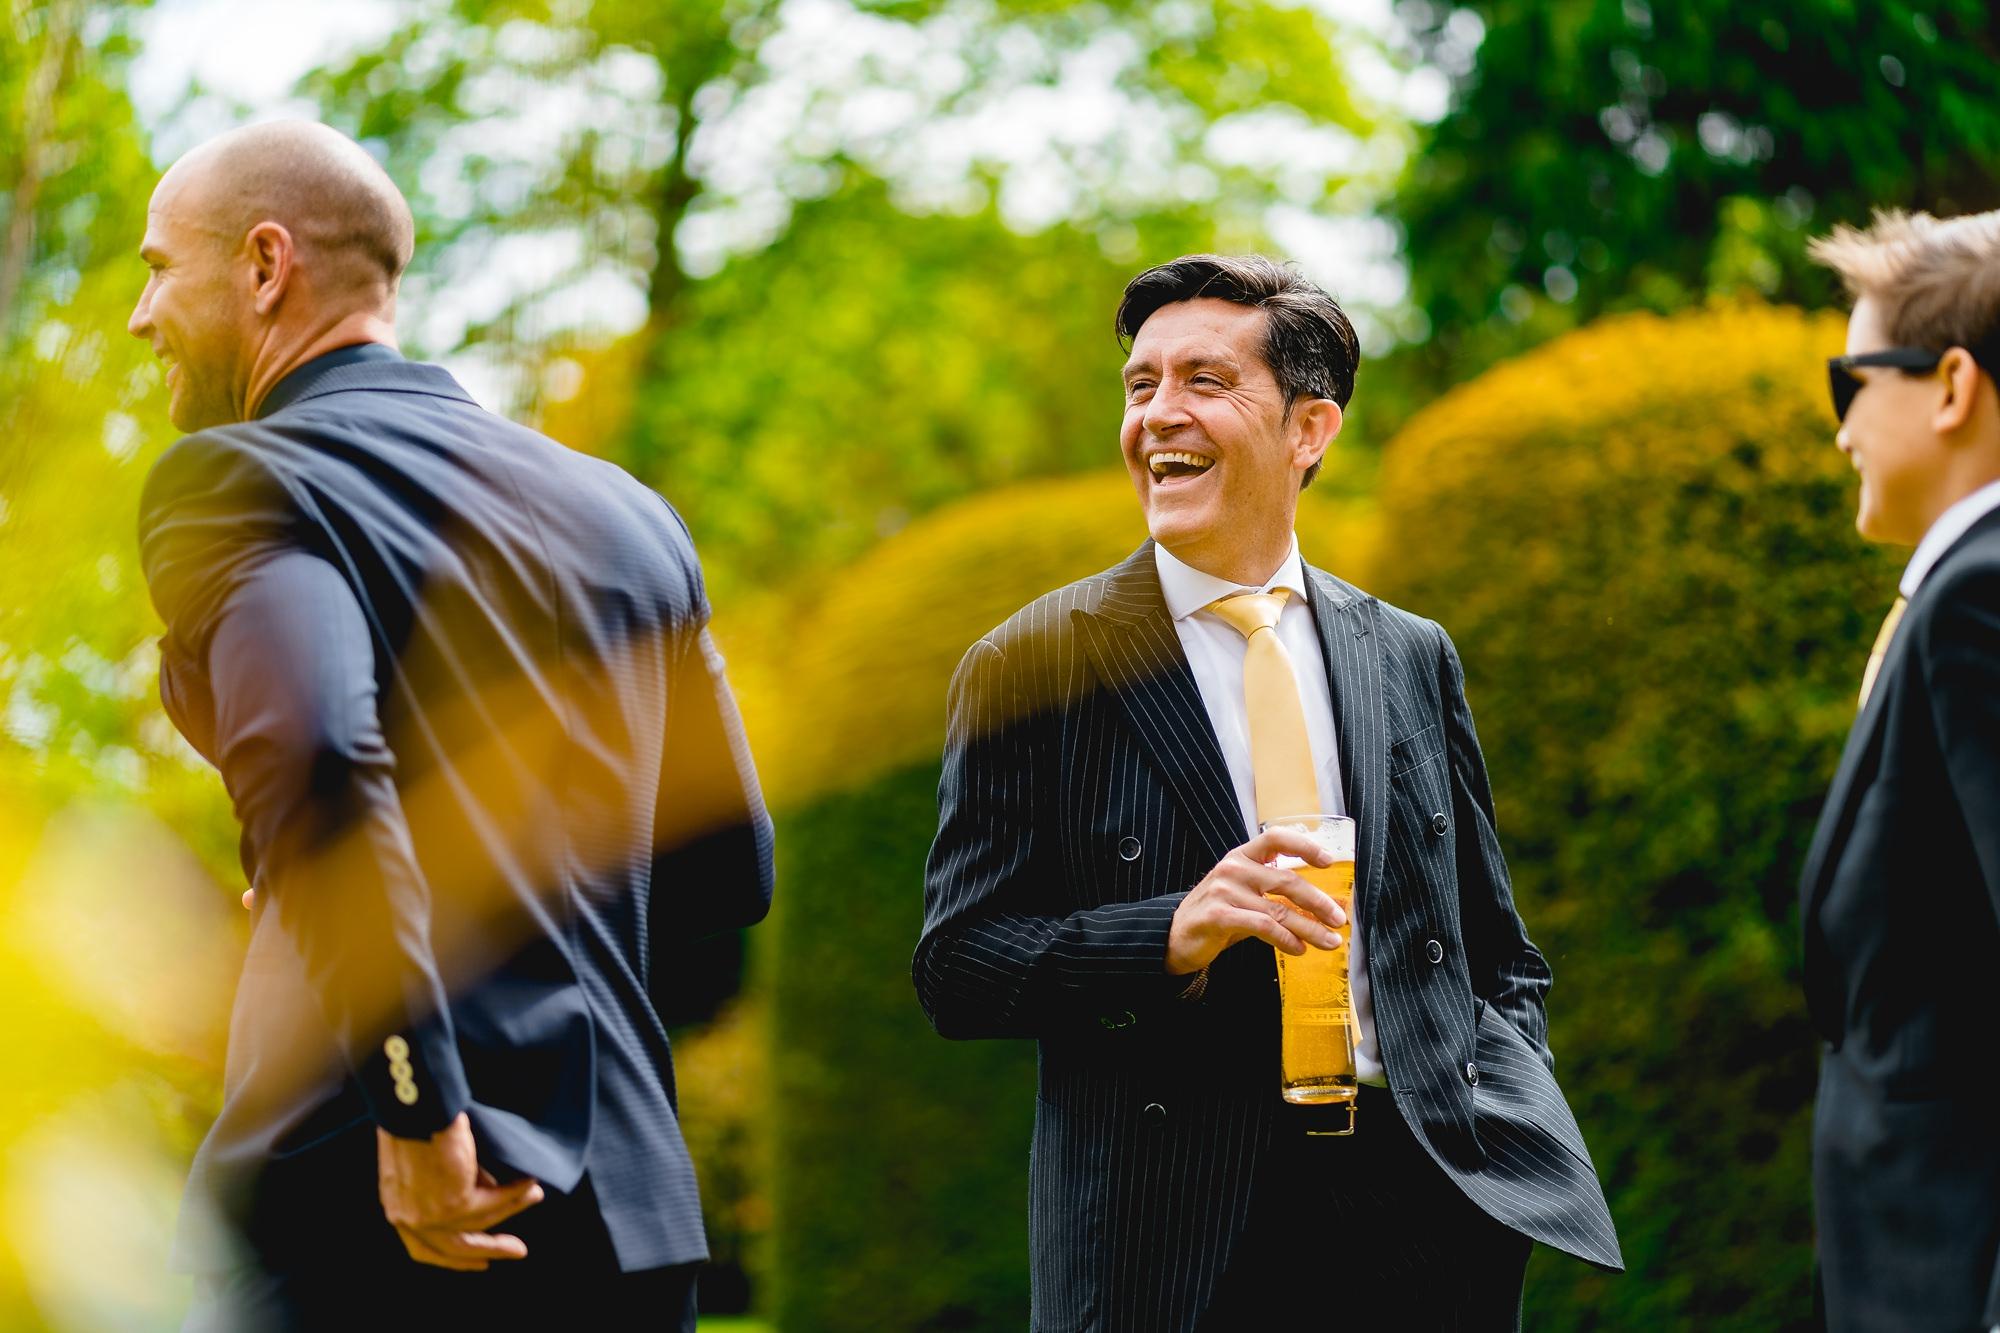 Soughton-Hall-Wedding-Photographer_0010.jpg